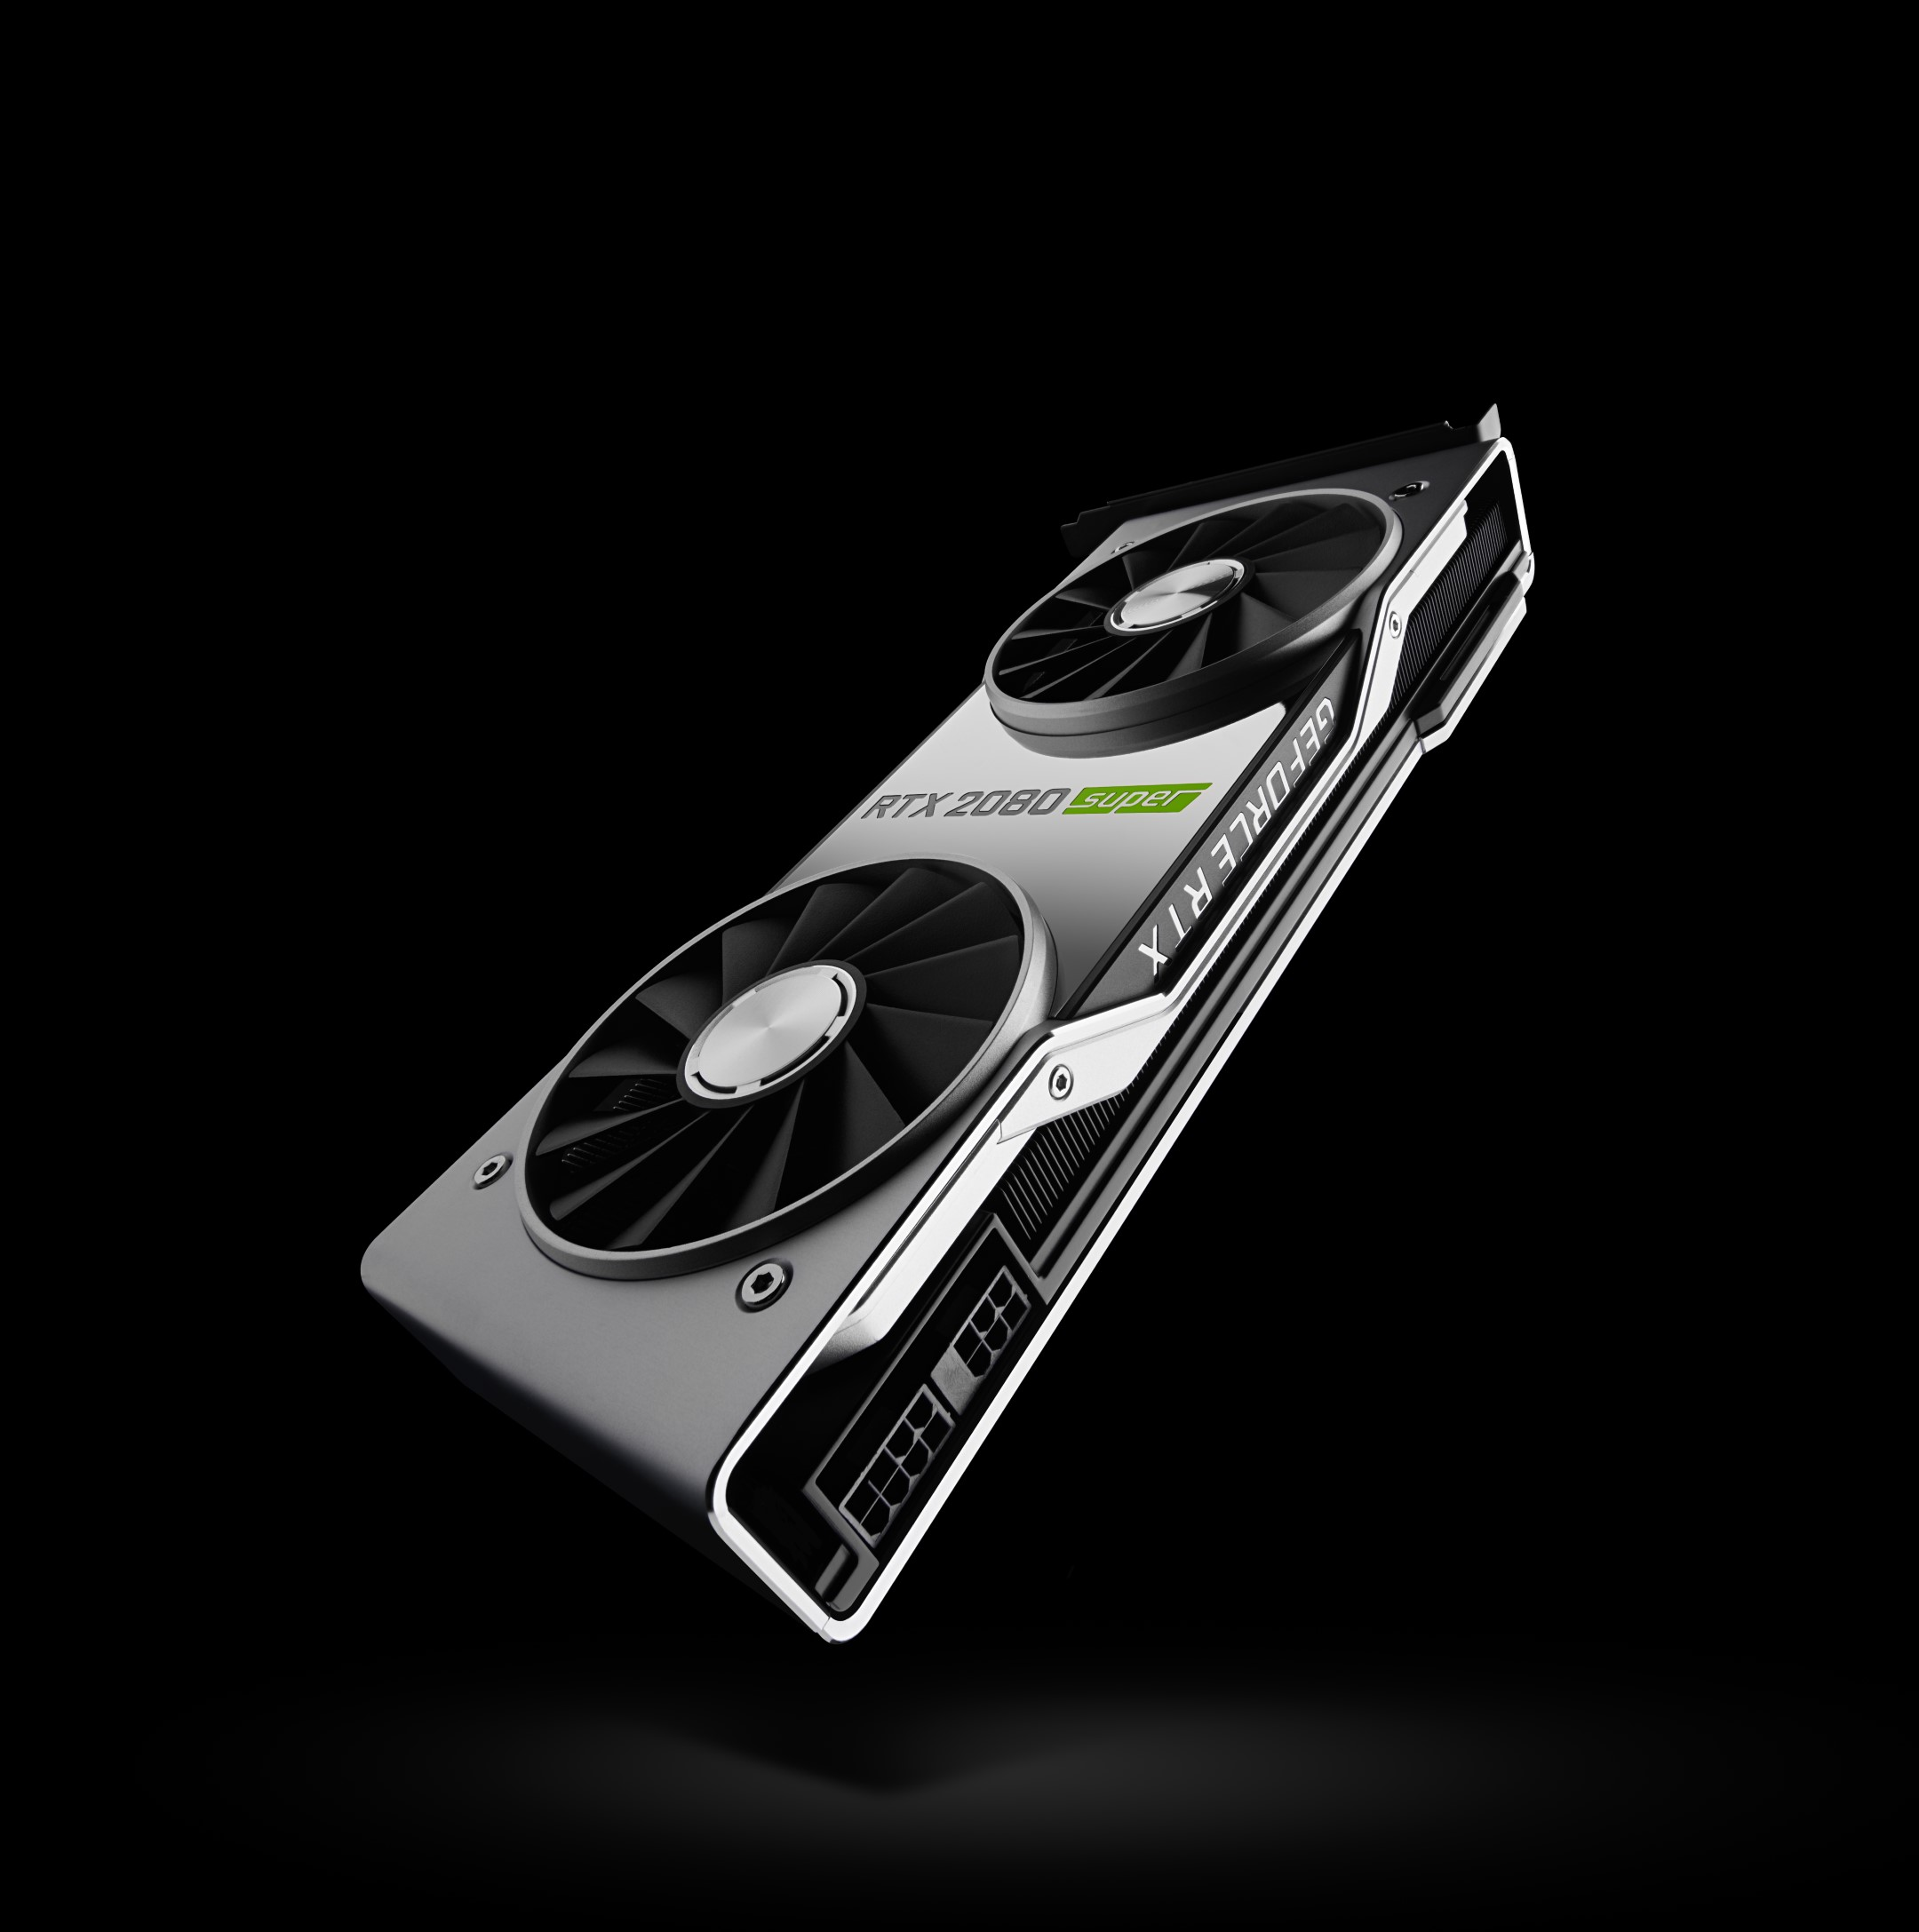 NVIDIA GeForce RTX 2080 SUPER GPU Benchmarks Leaks Out